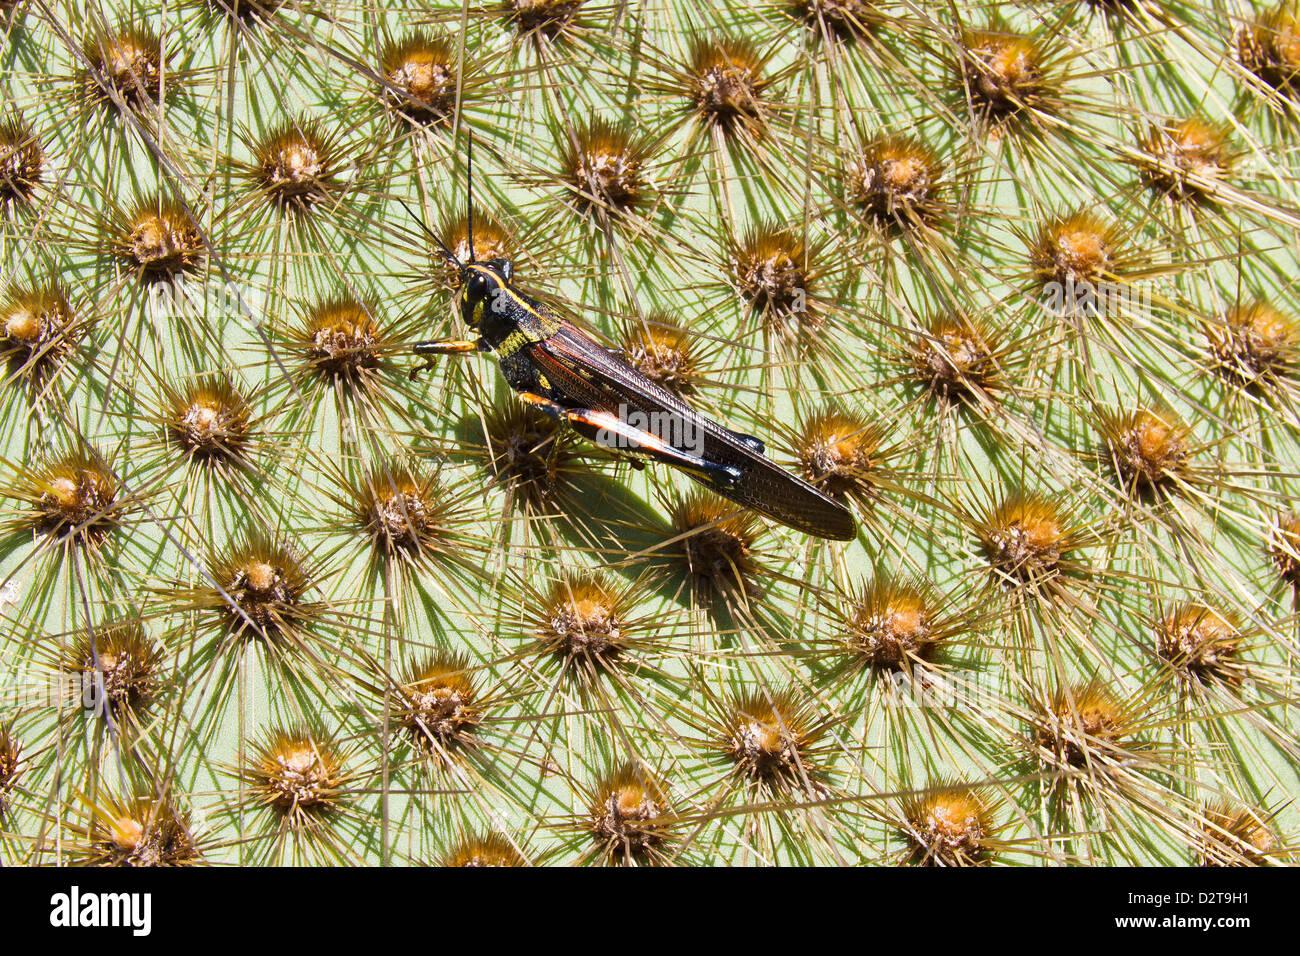 Painted locust (Schistocerca melanocera) on endemic opuntia cactus, Cerro Dragon, Santa Cruz Island, Galapagos Islands, - Stock Image